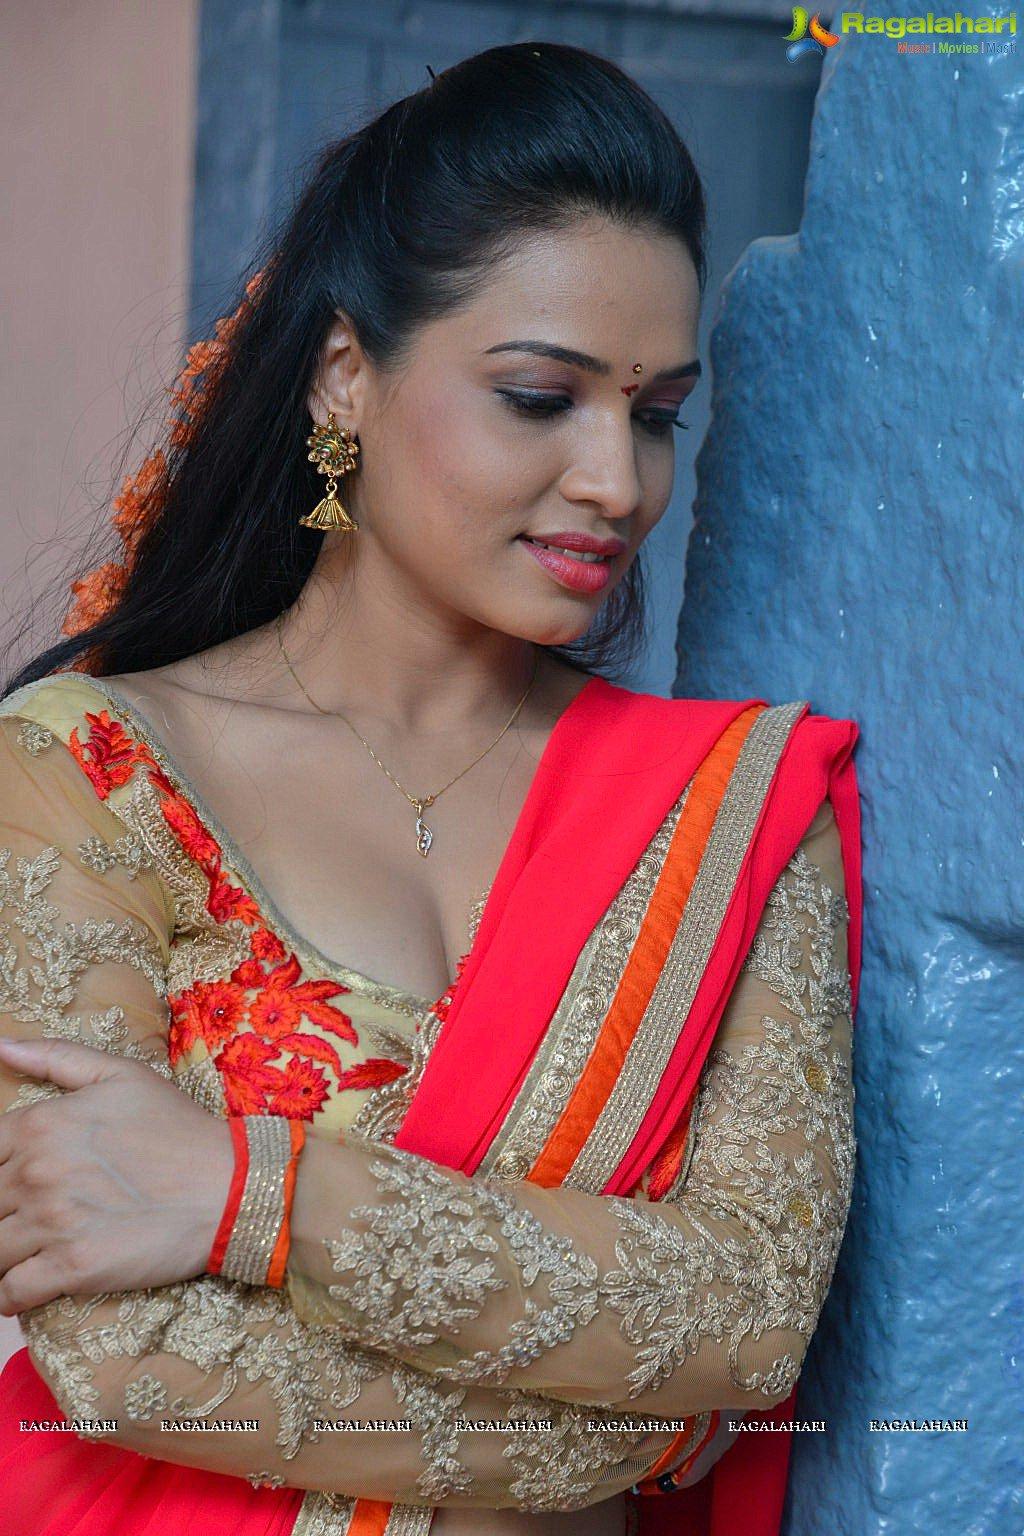 Anasuya boobs cleavage - 2 6